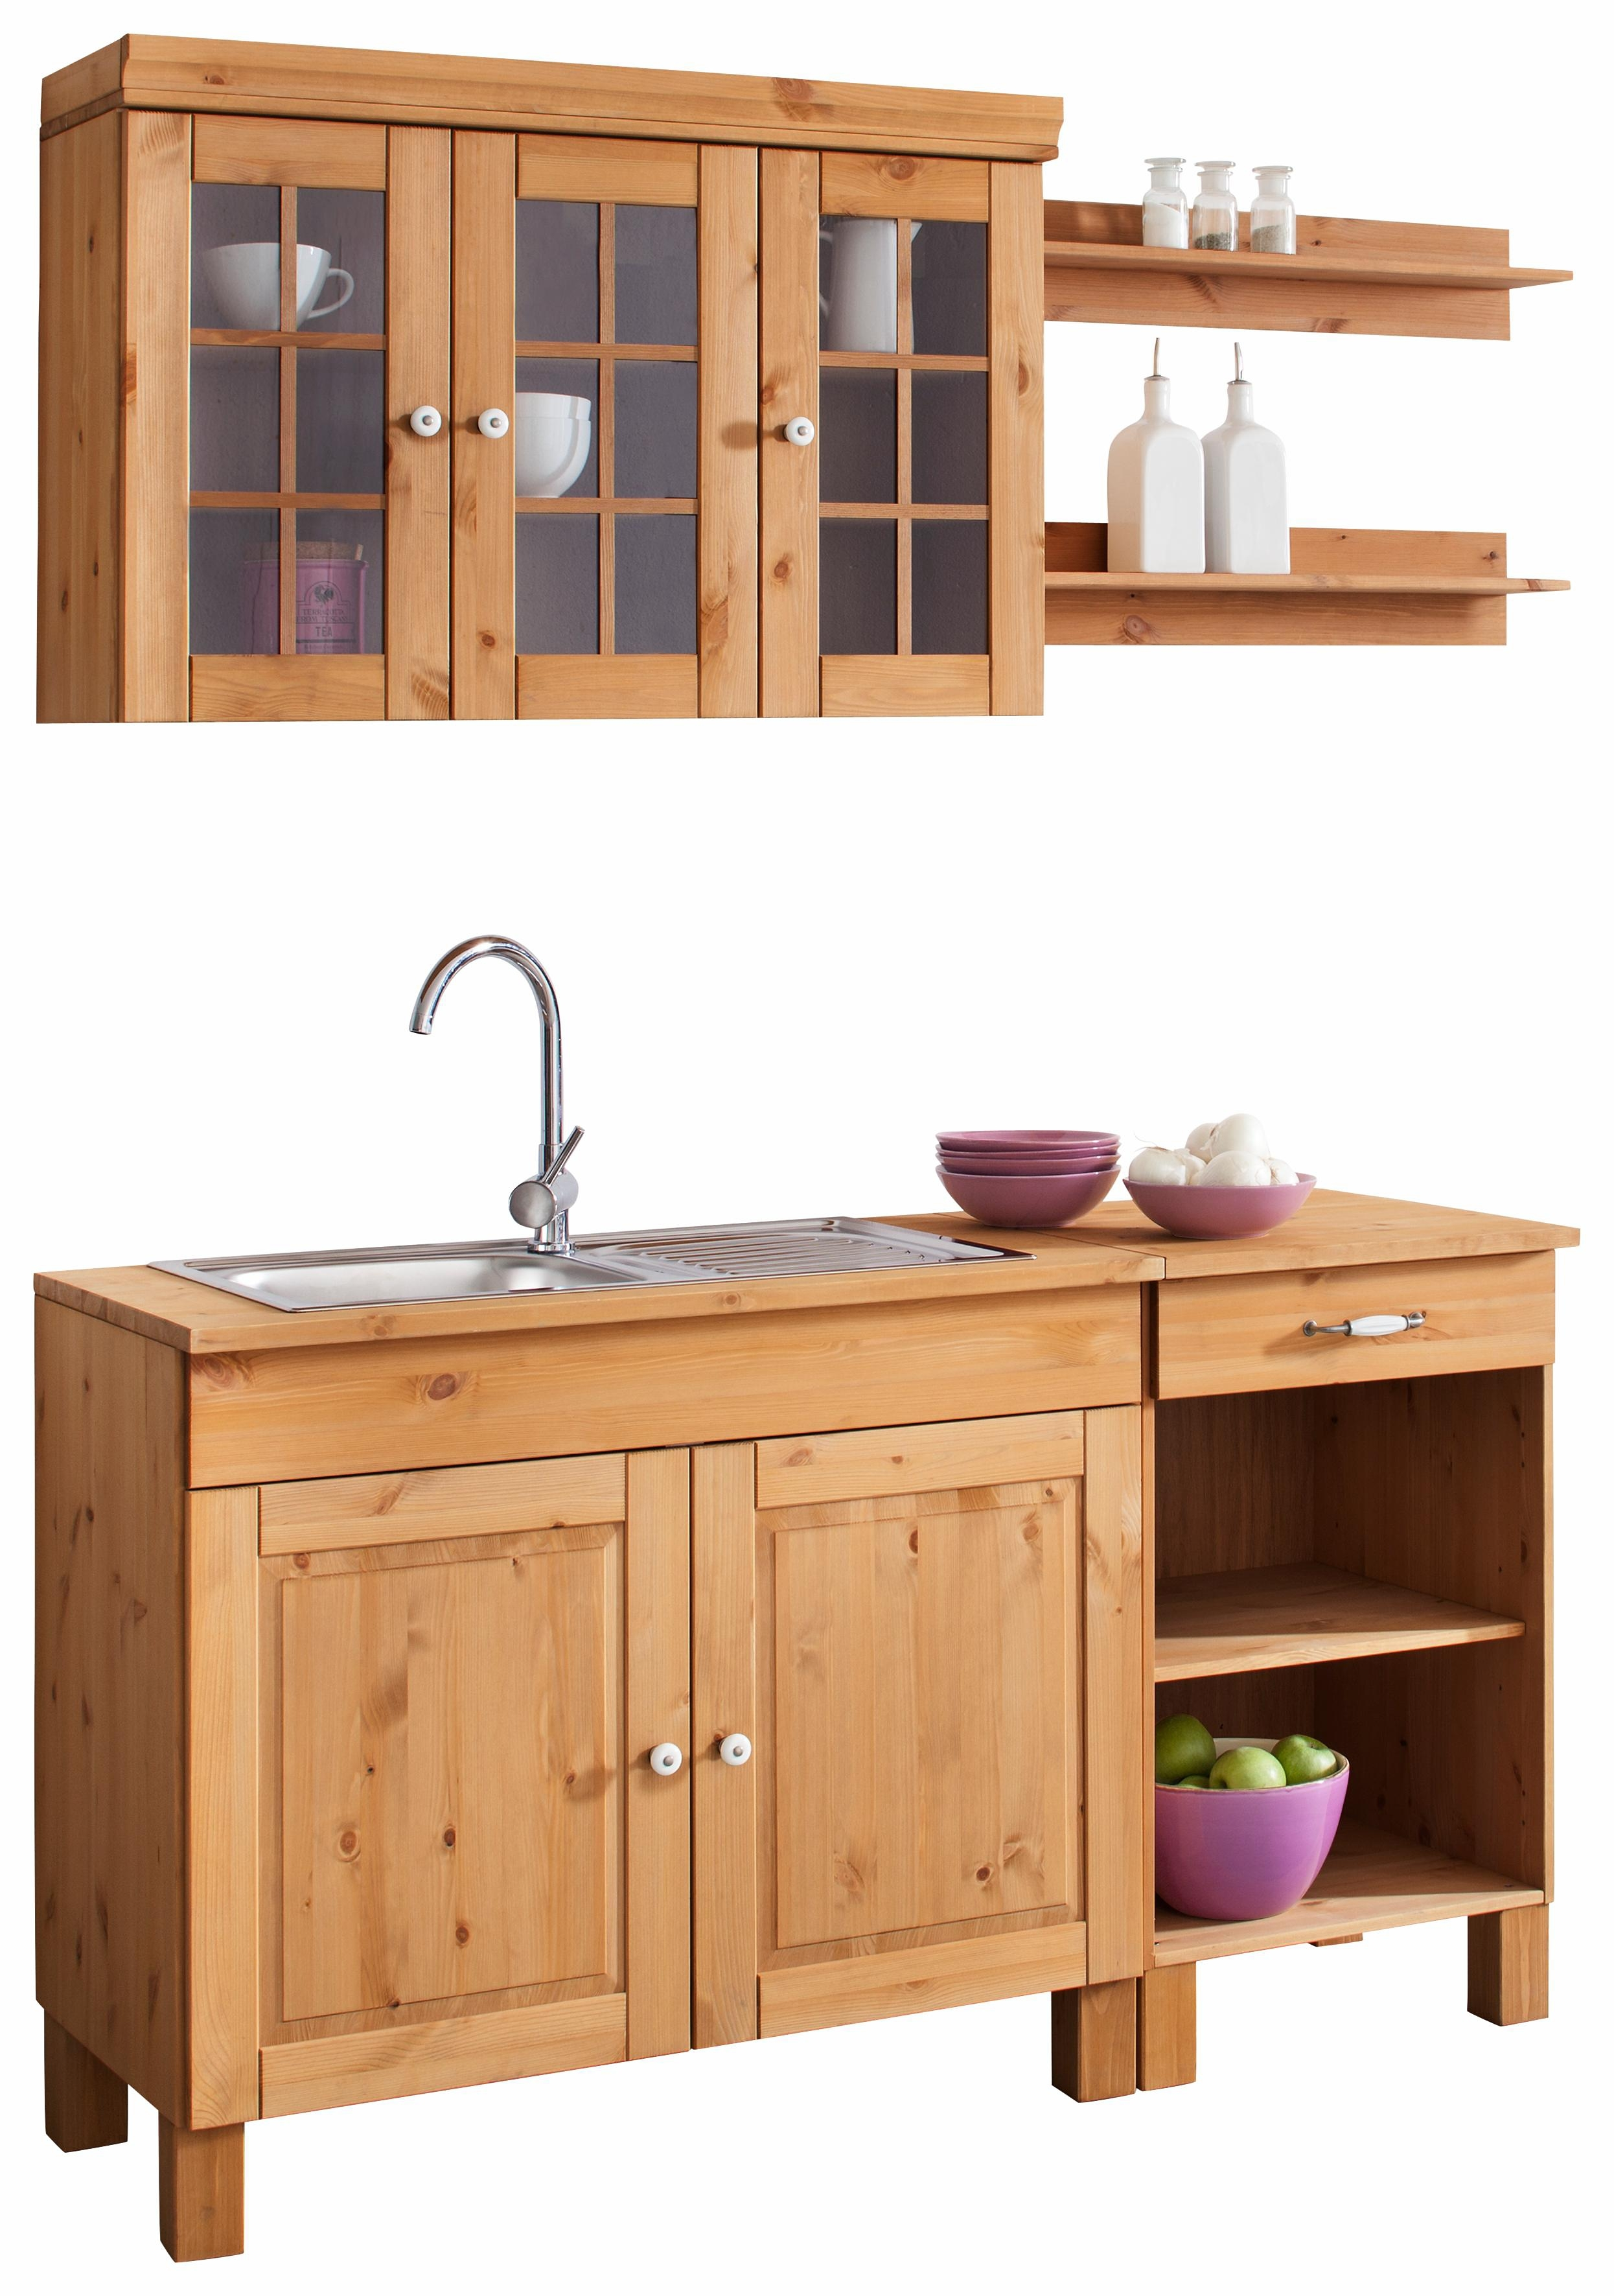 goedkope keukenblokken online shop nu online kopen otto. Black Bedroom Furniture Sets. Home Design Ideas